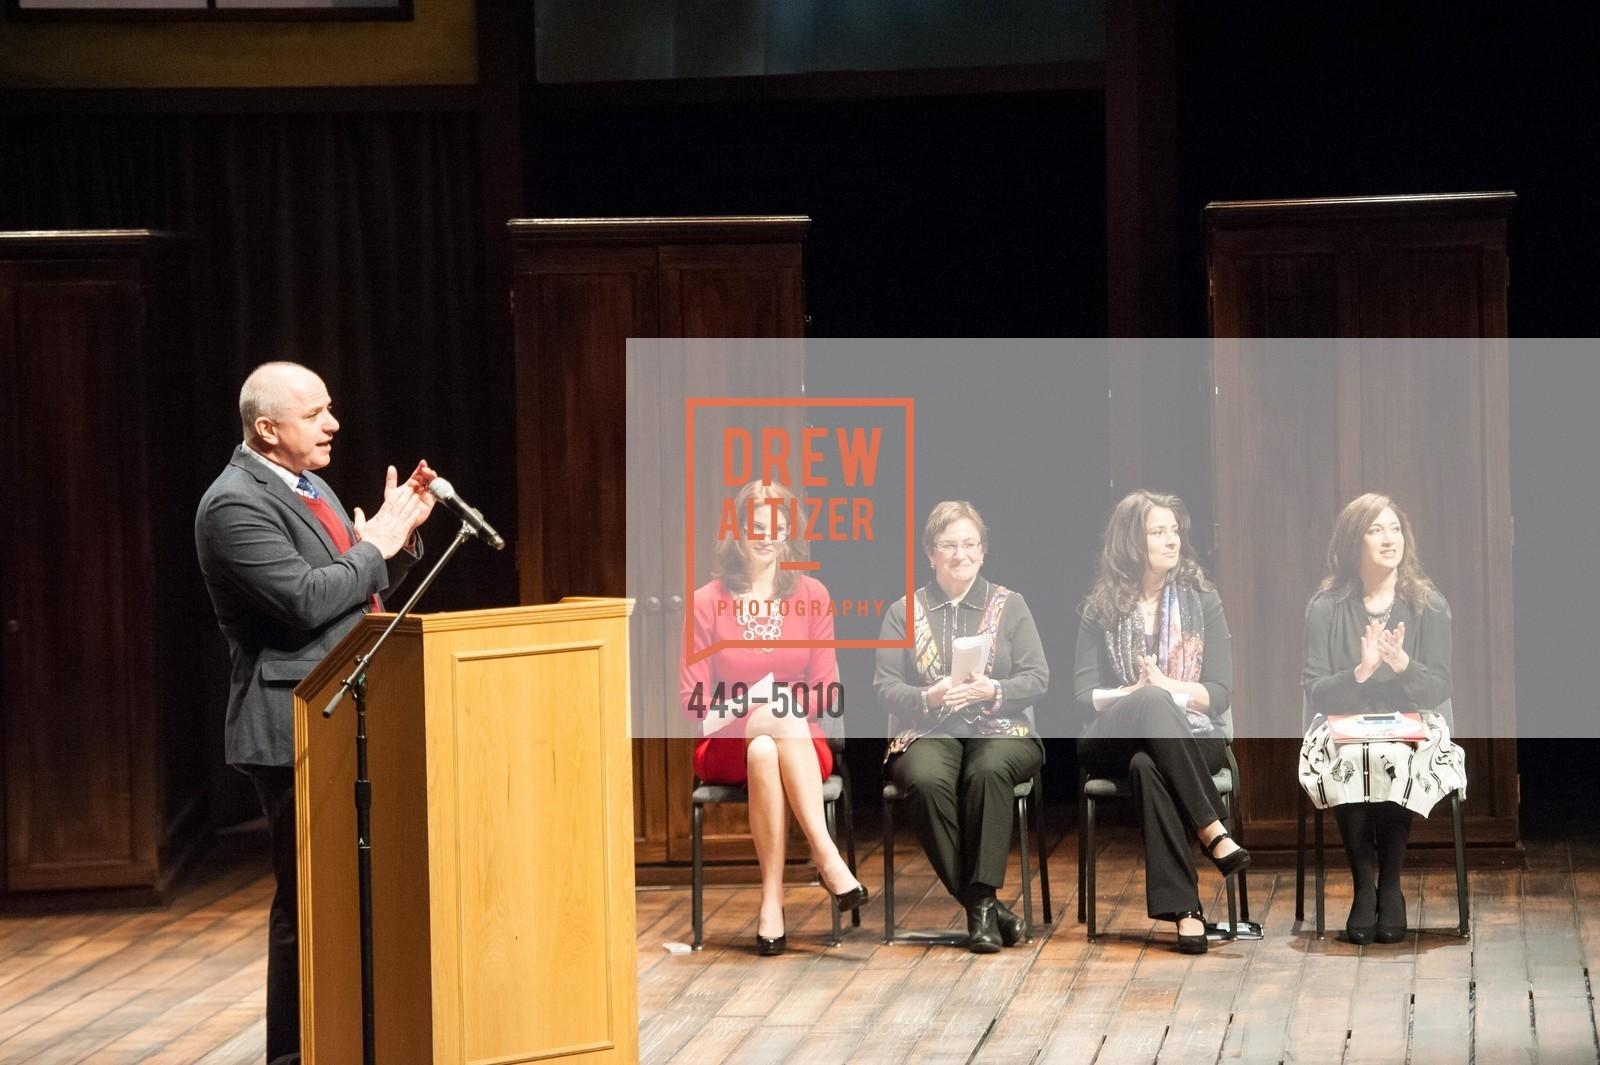 Phil Santora, Jenny Dearborn, Ann Bowers, Natalie Batalha, Randi Zuckerberg, Photo #449-5010